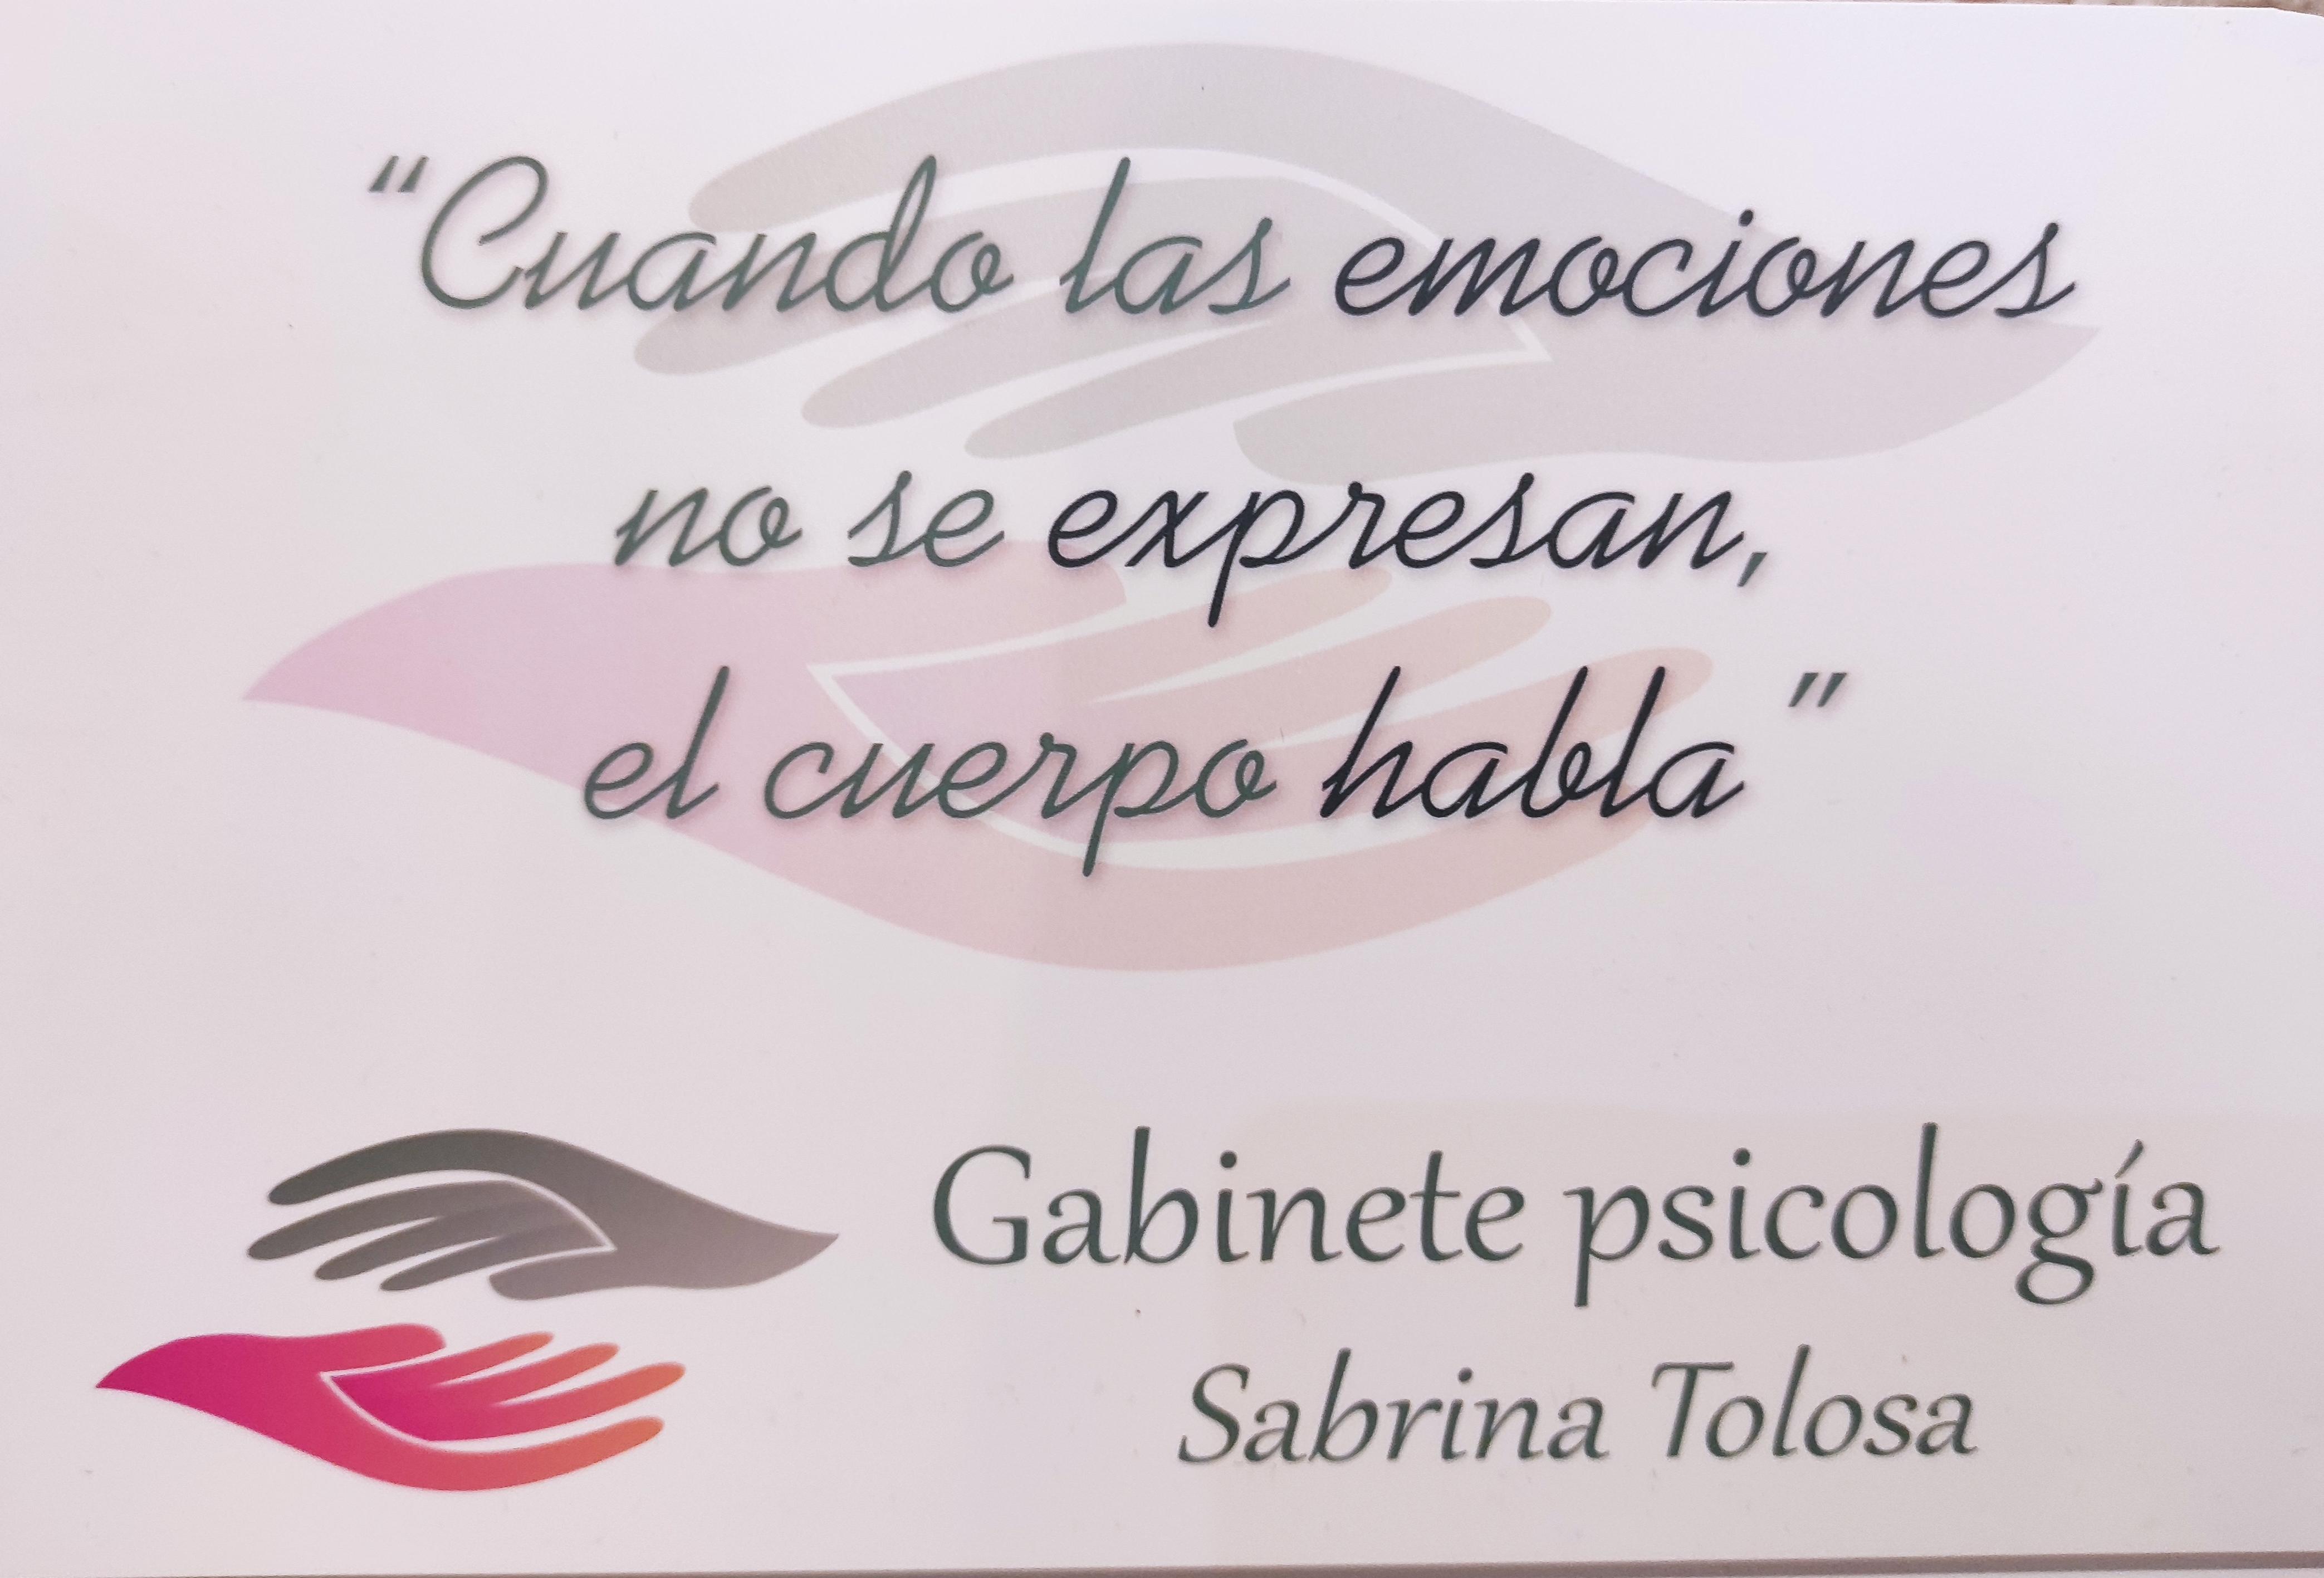 Psicóloga Sabrina Tolosa